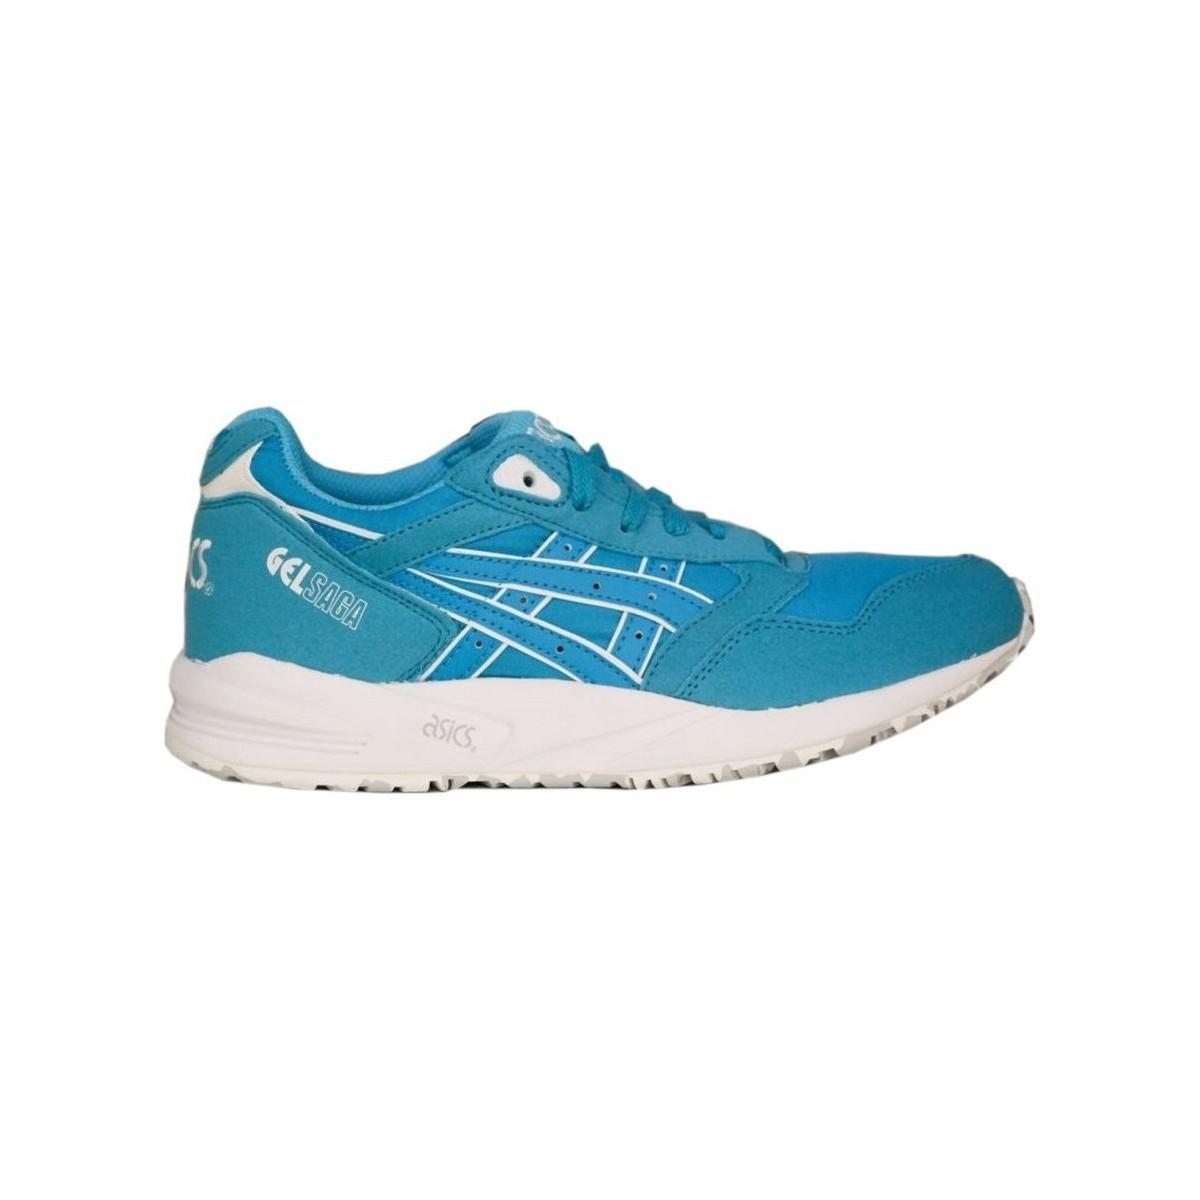 Asics - Tiger Gel Saga Summer Kite Pack Atomic Blue Women\u0027s Shoes (trainers)  In. View fullscreen